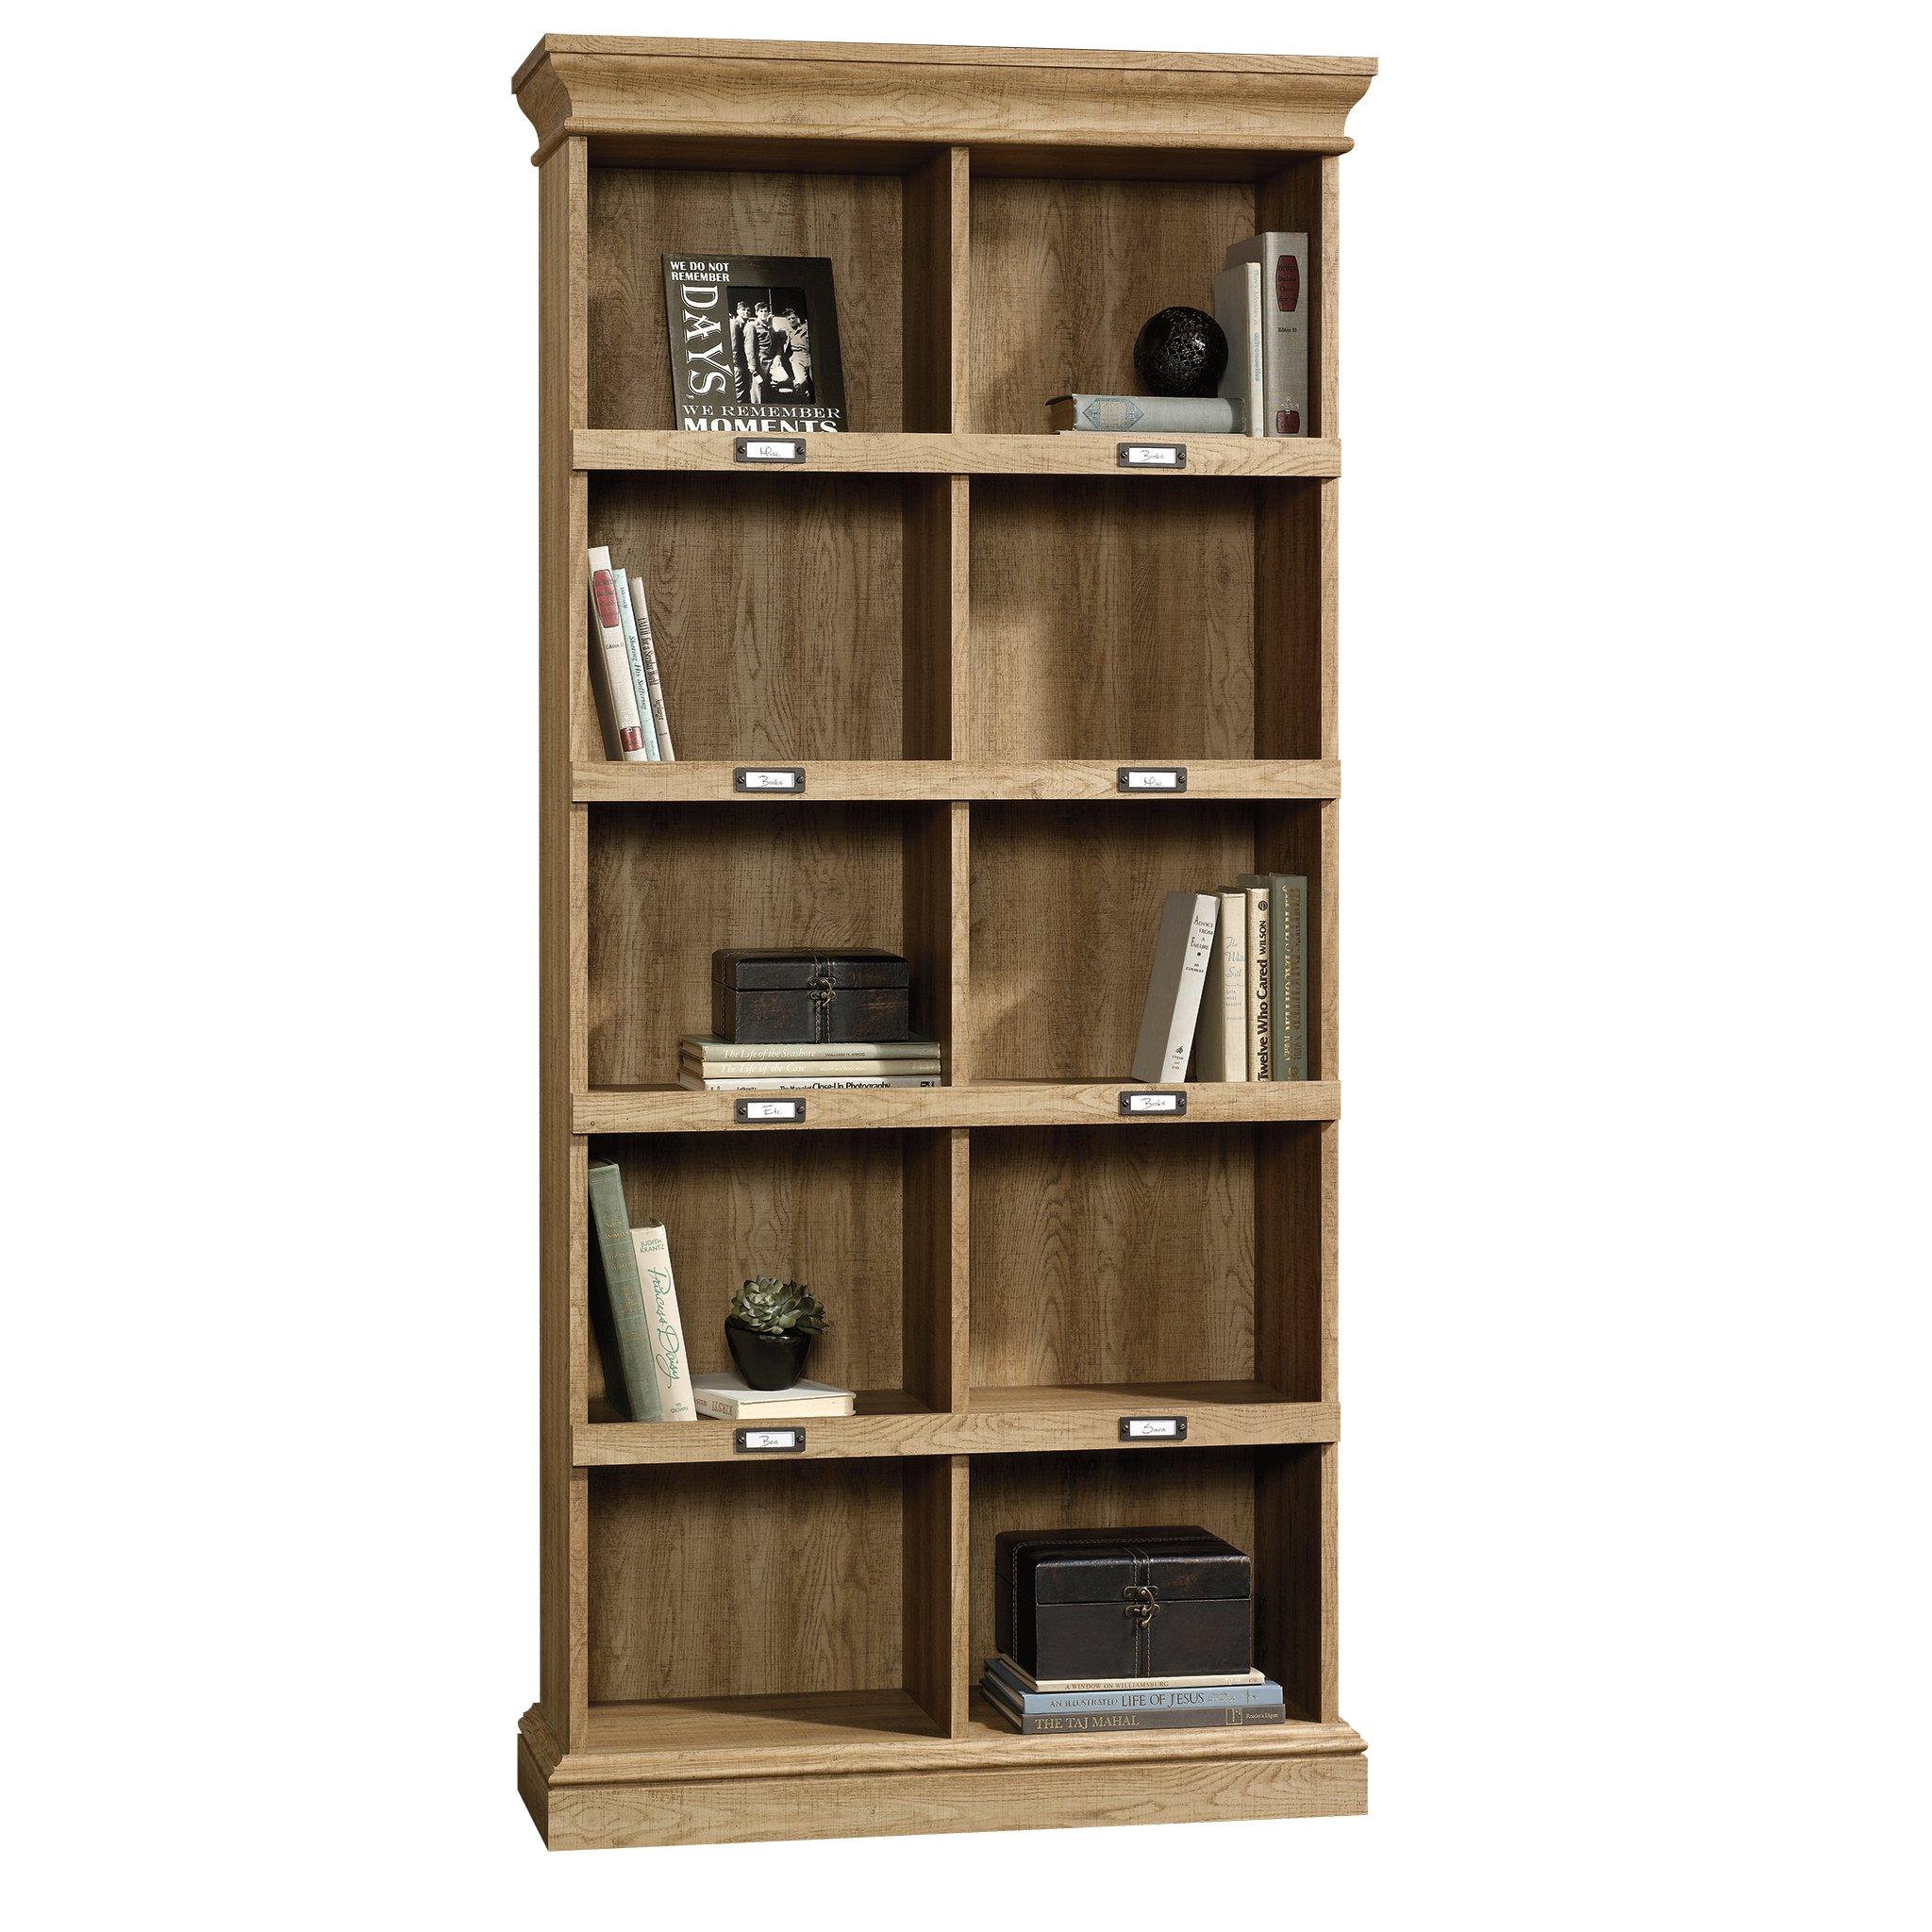 Sauder 414725 Barrister Lane Bookcase, L: 35.55'' x W: 13.50'' x H: 75.04'', Scribed Oak finish by Sauder (Image #2)